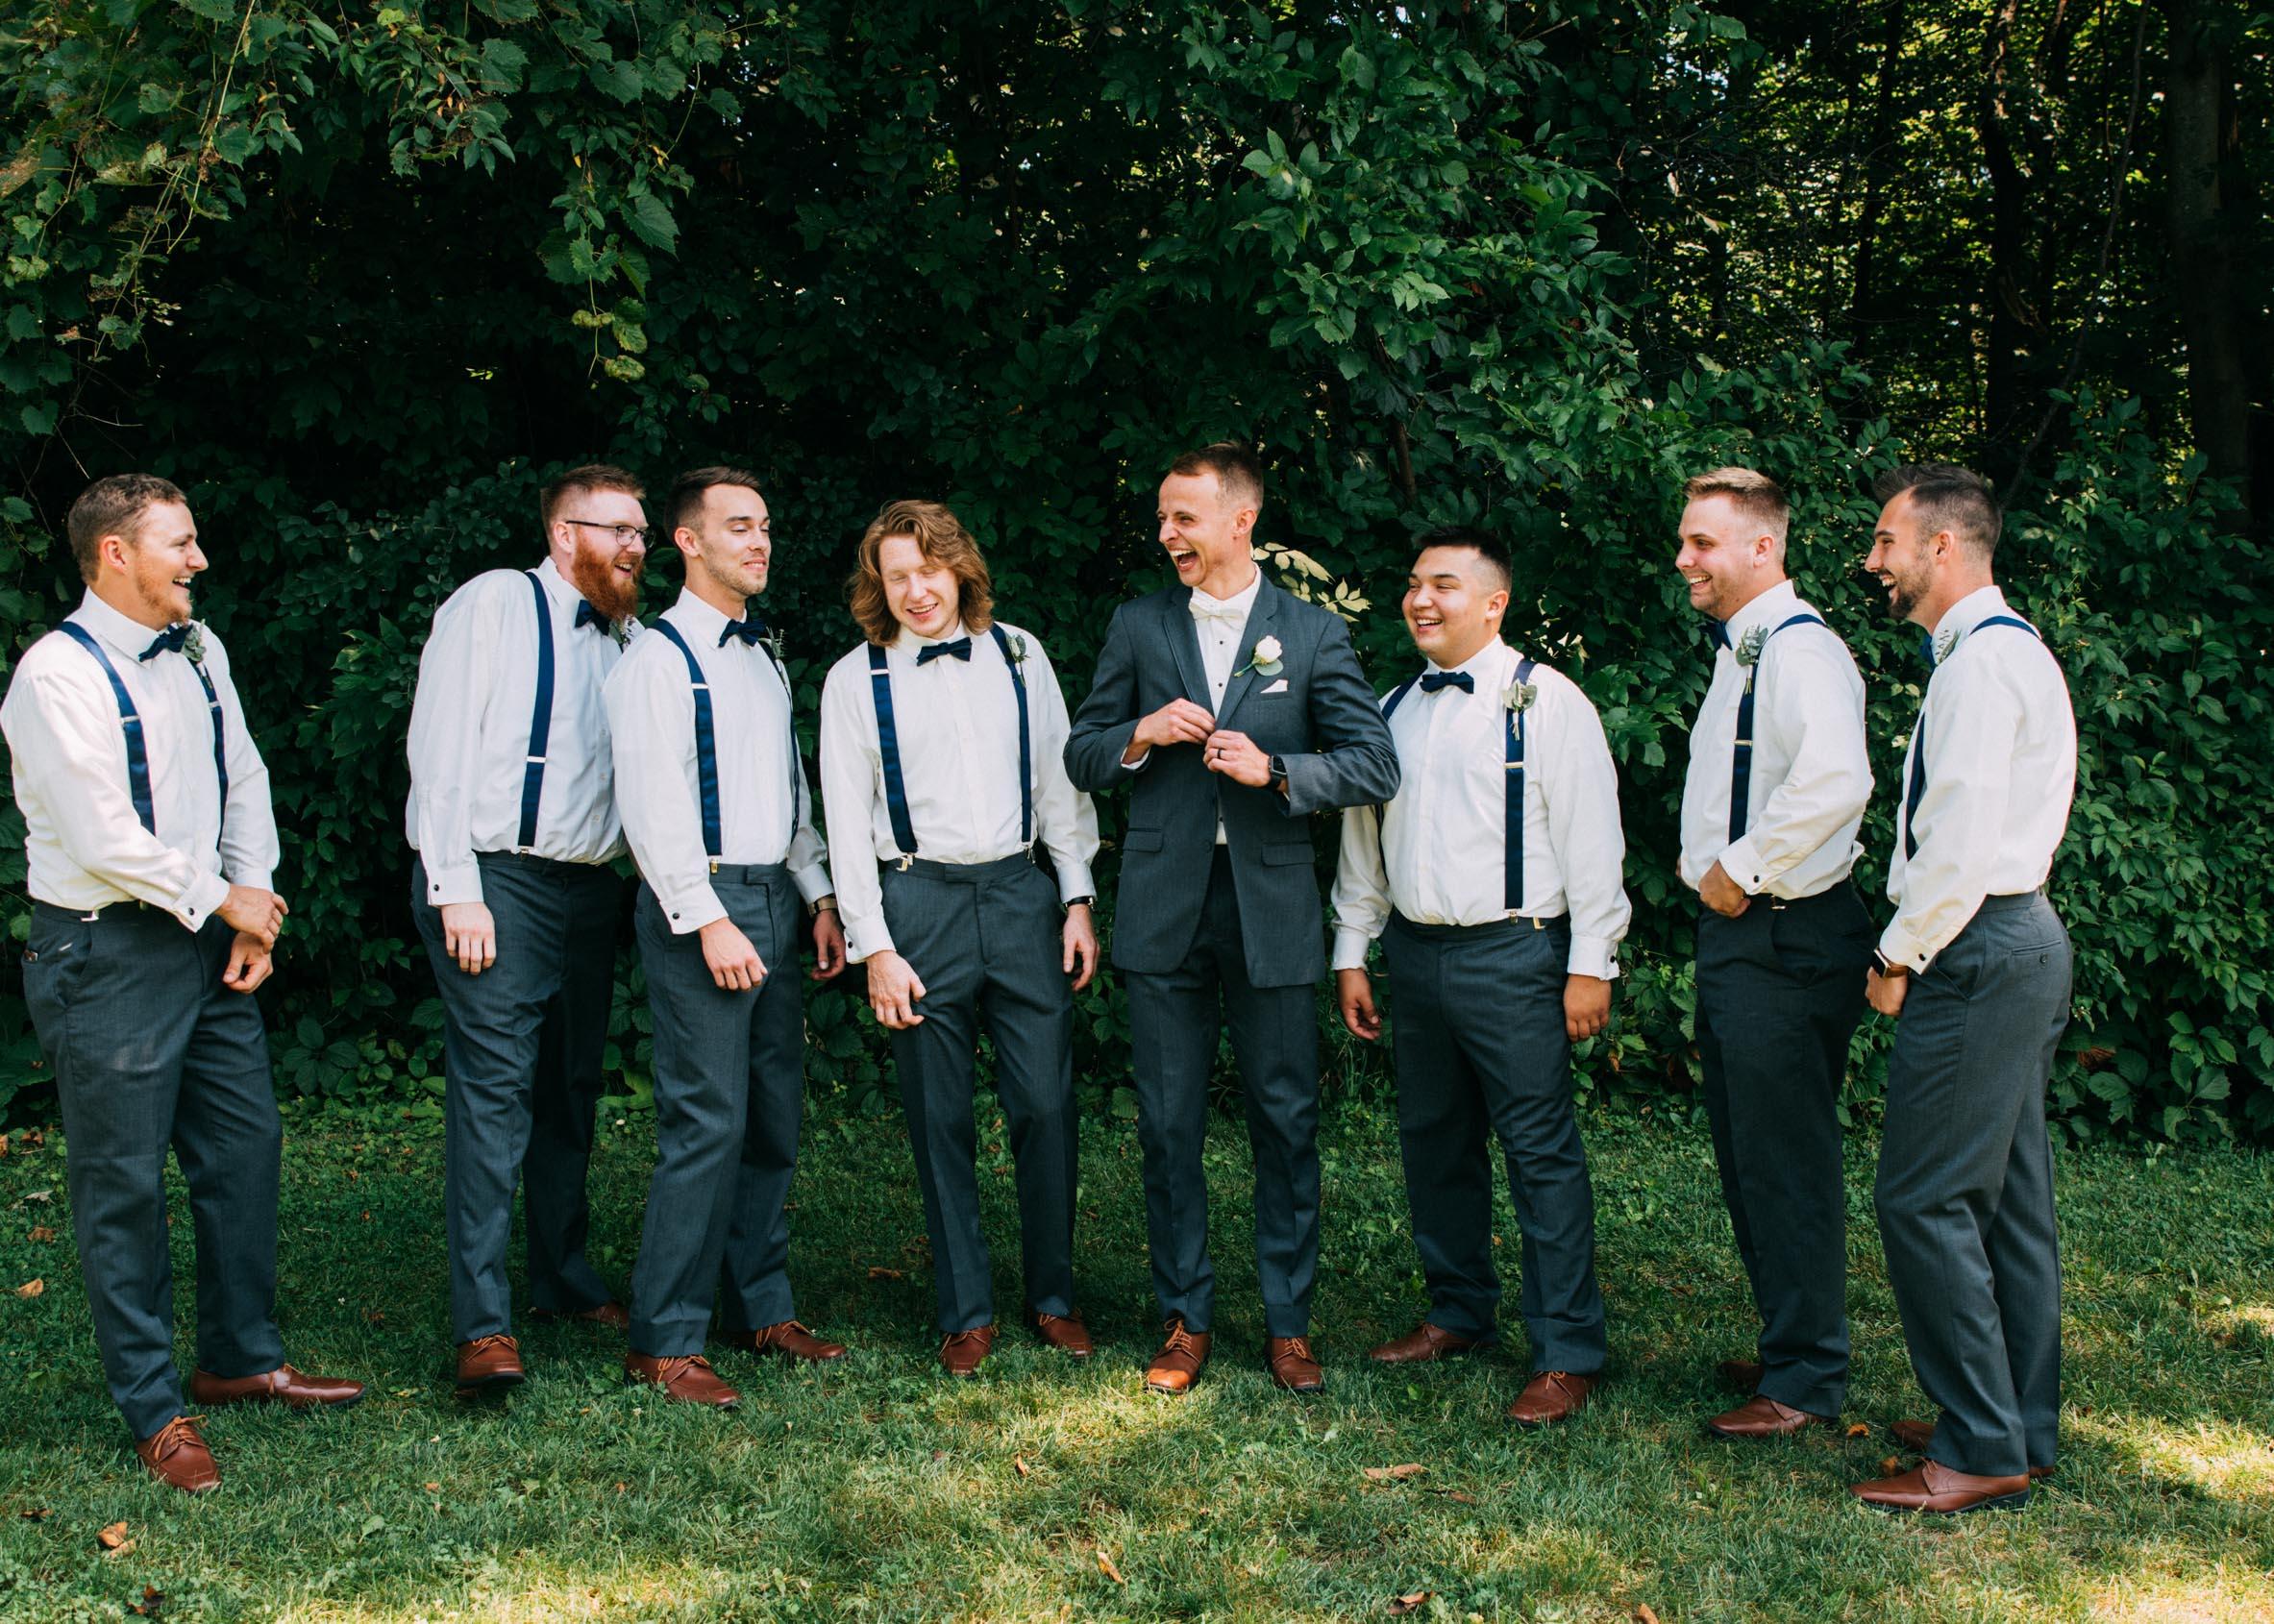 16-Minnetonka Orchards Wedding Ashley Bryce Blog.jpg